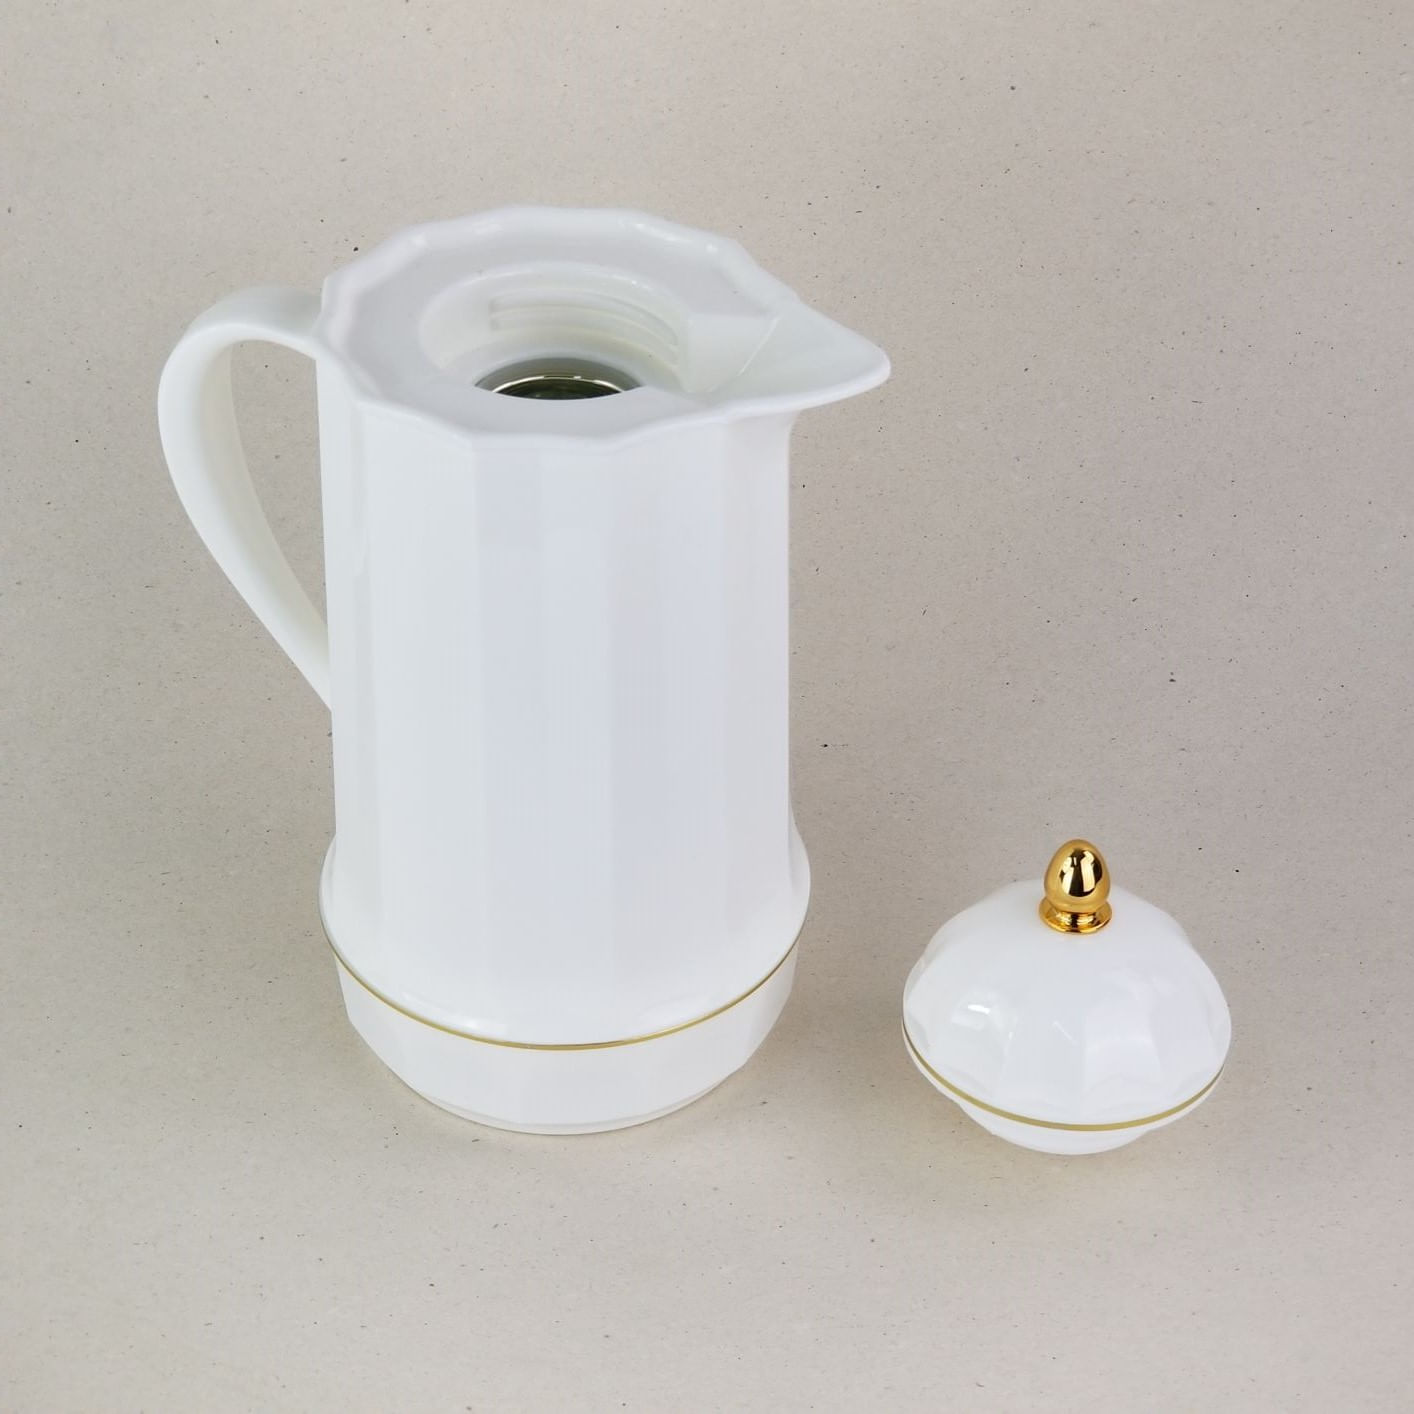 Garrafa Térmica Branca e Dourada Com Ampola de Vidro 1L